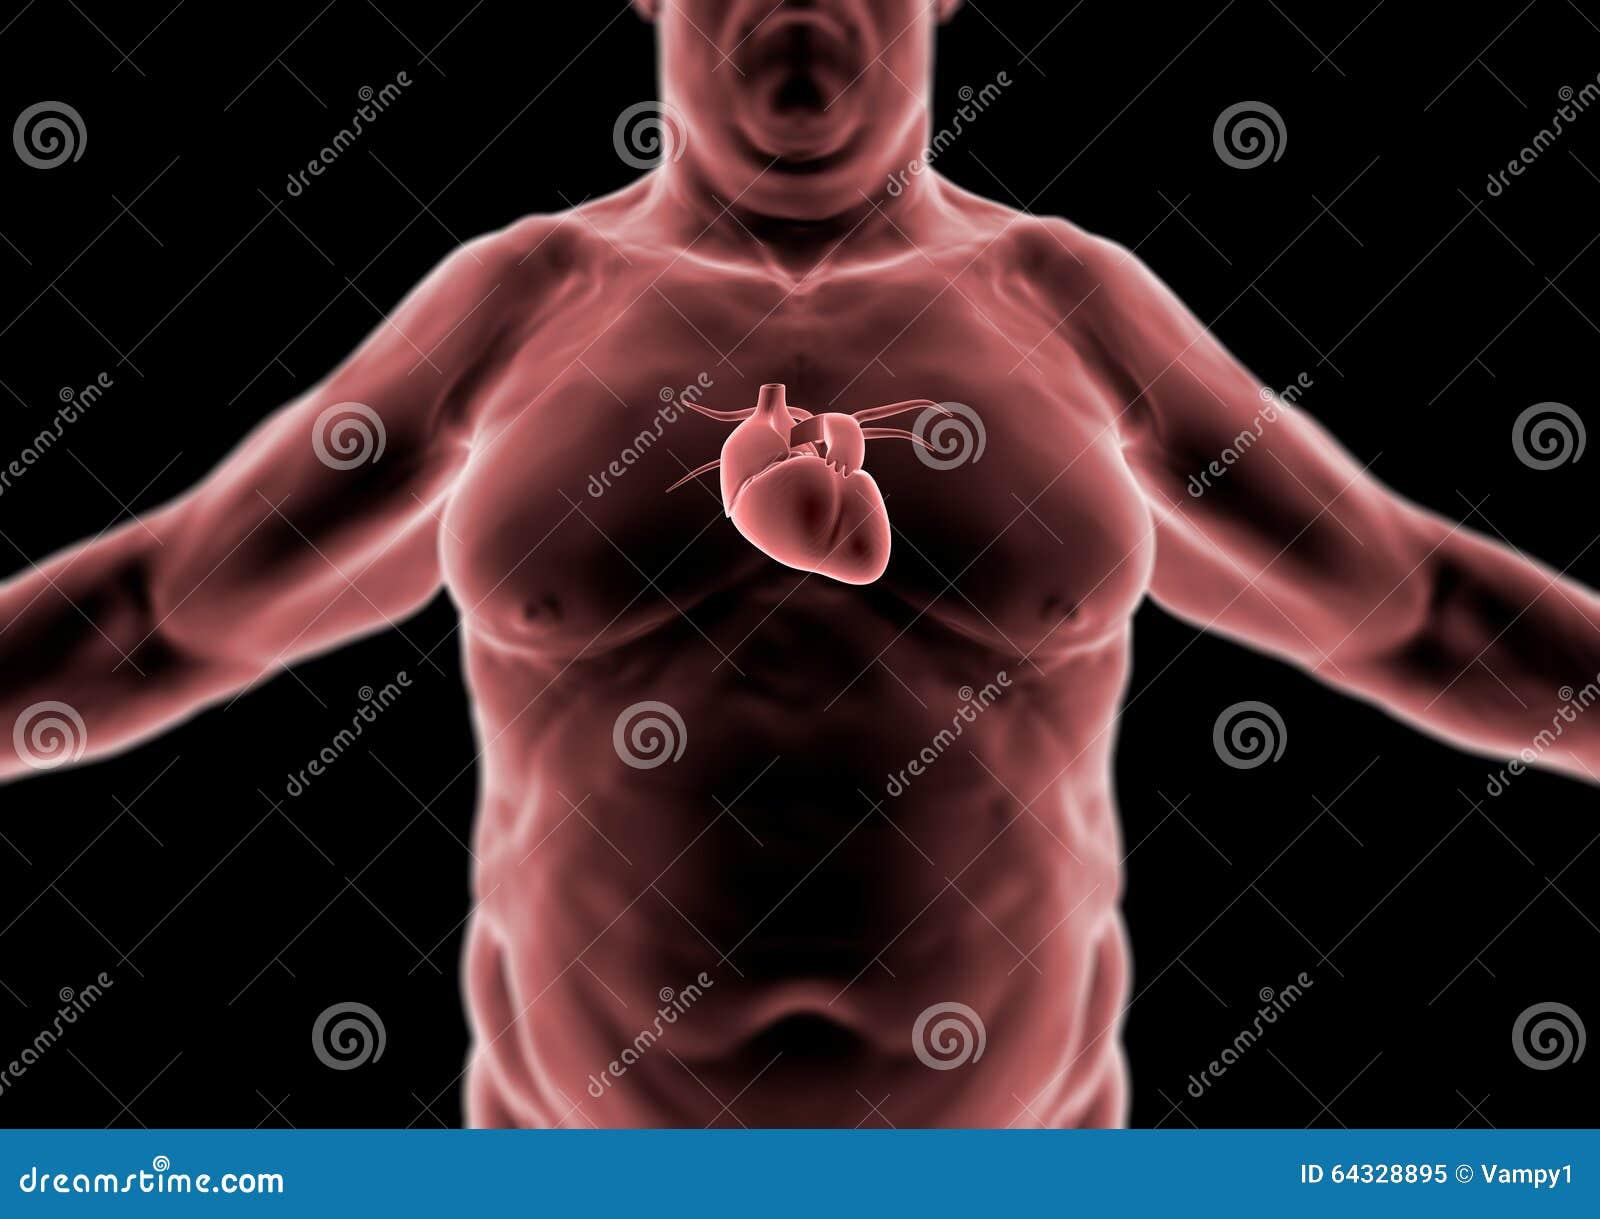 Human Body, Fat Person, Heart Stock Illustration - Illustration of ...